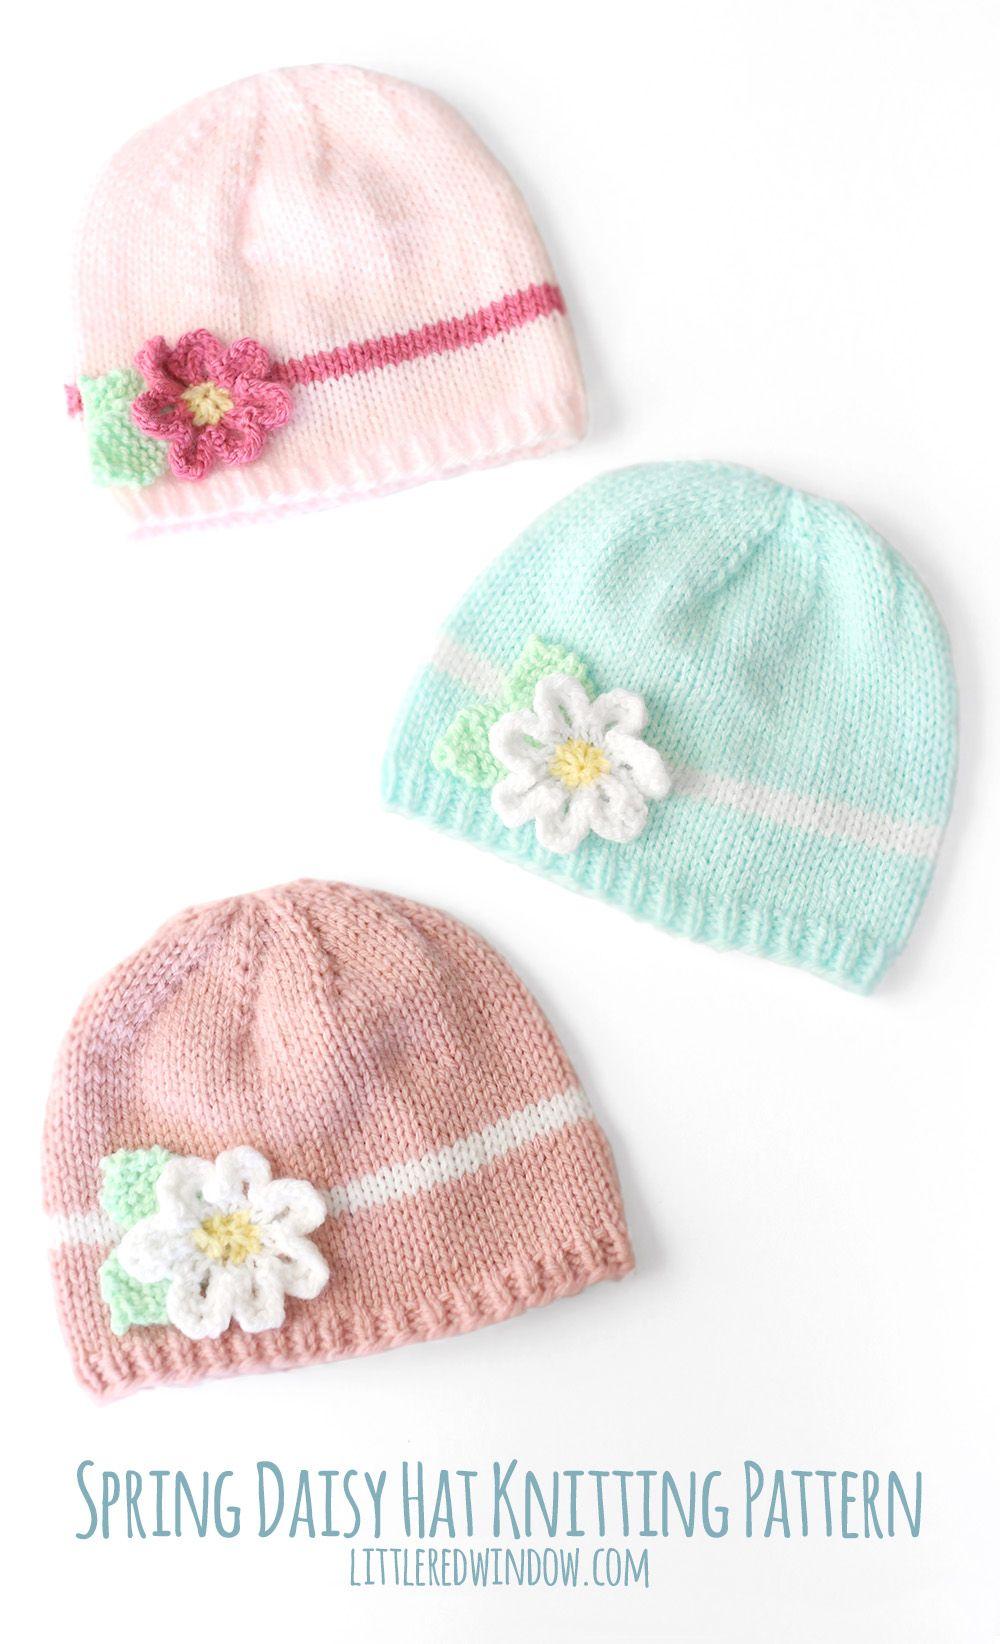 Spring Daisy Hat Knitting Pattern | Knitting patterns, Patterns and ...